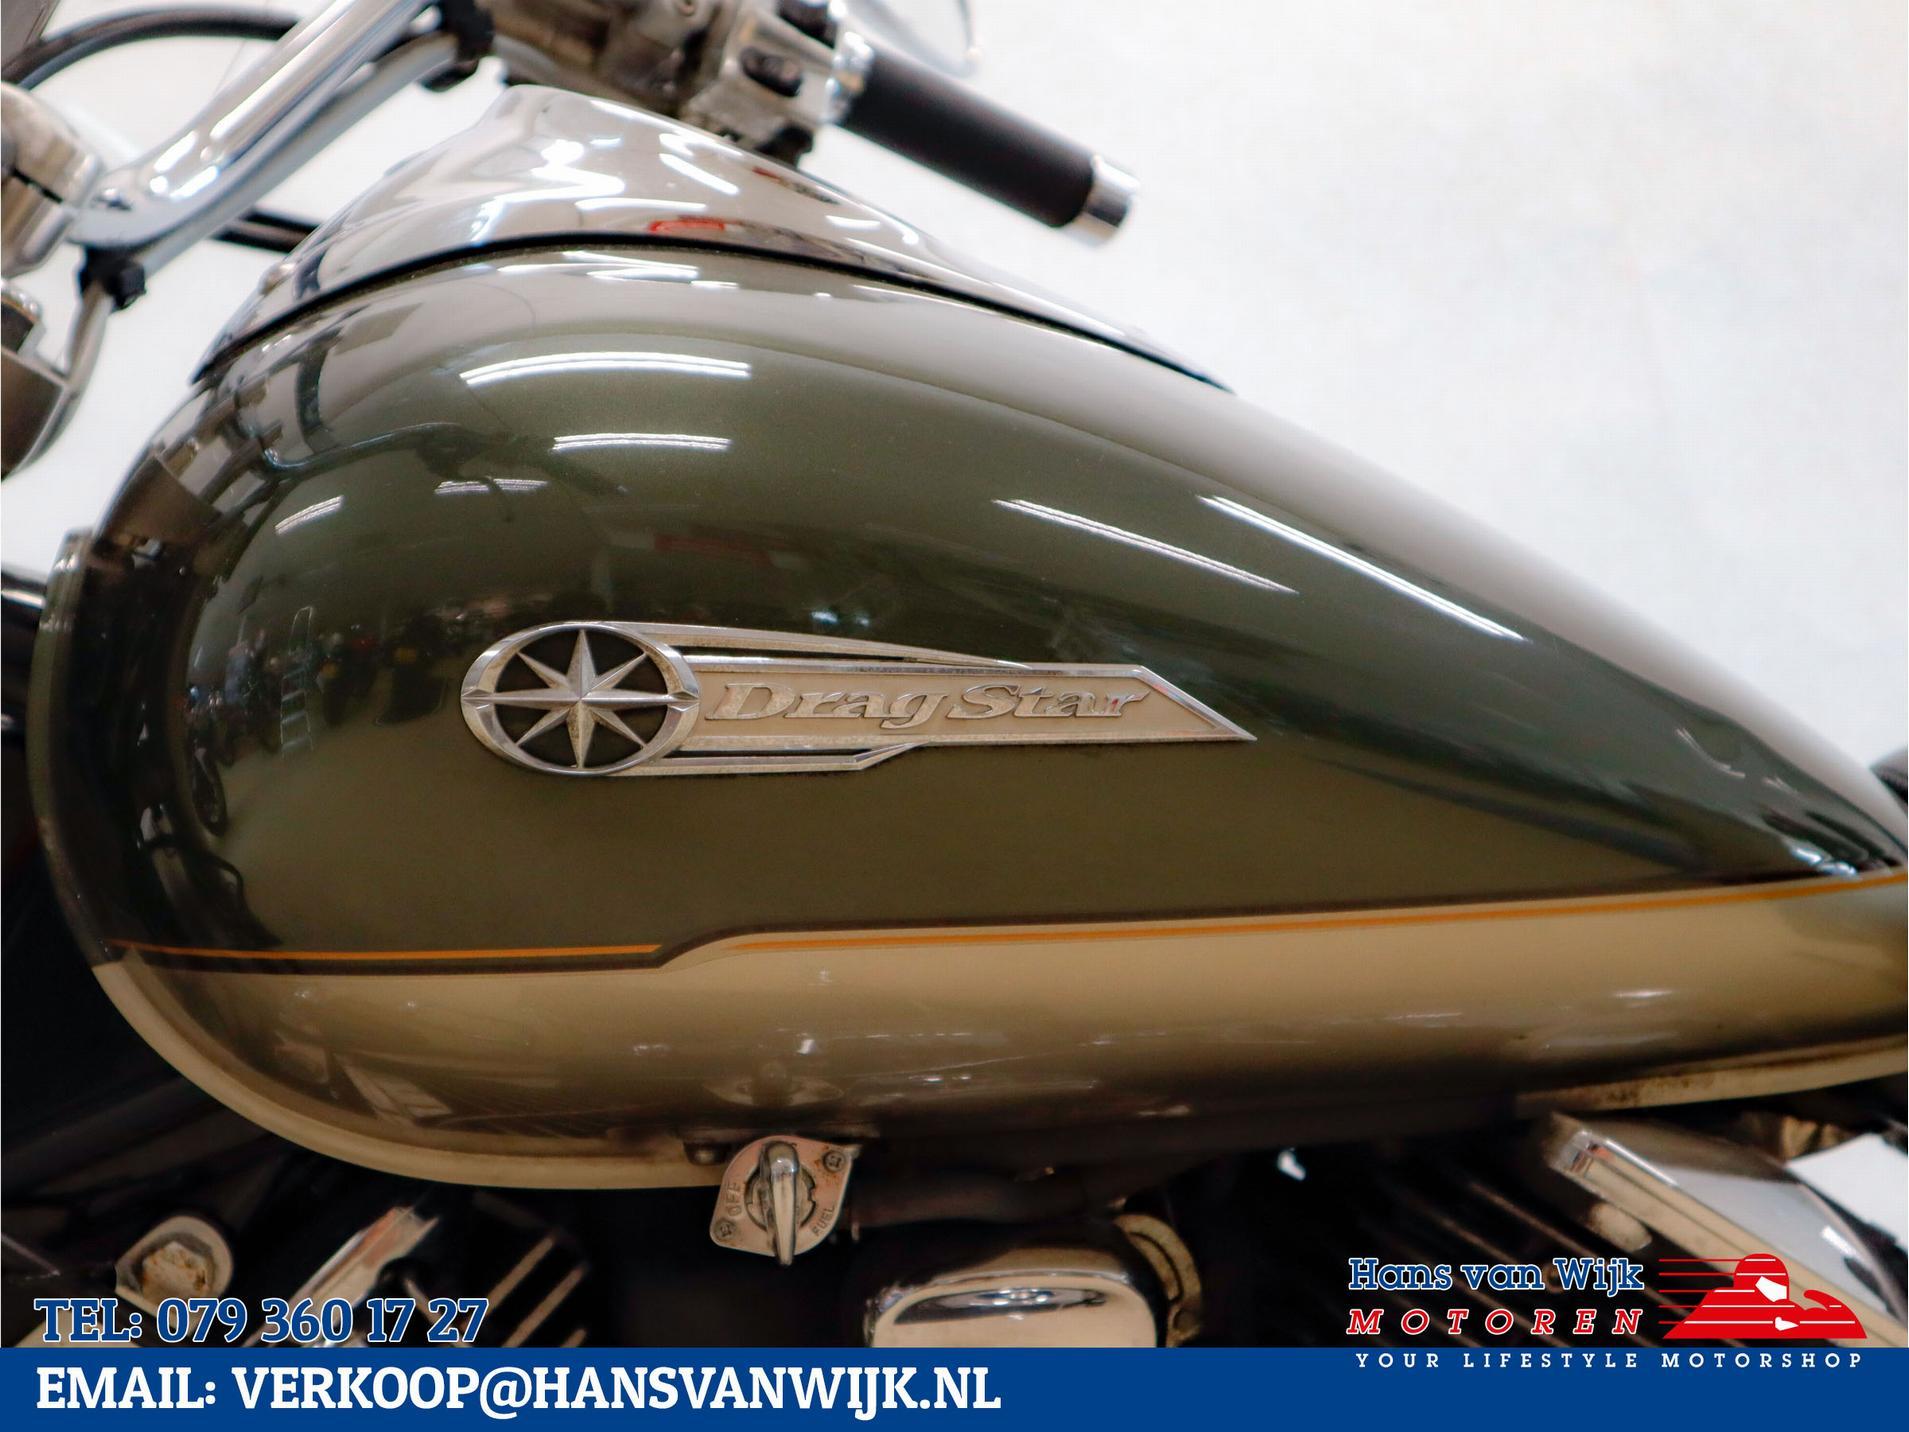 YAMAHA - XVS1100A Dragstar classic